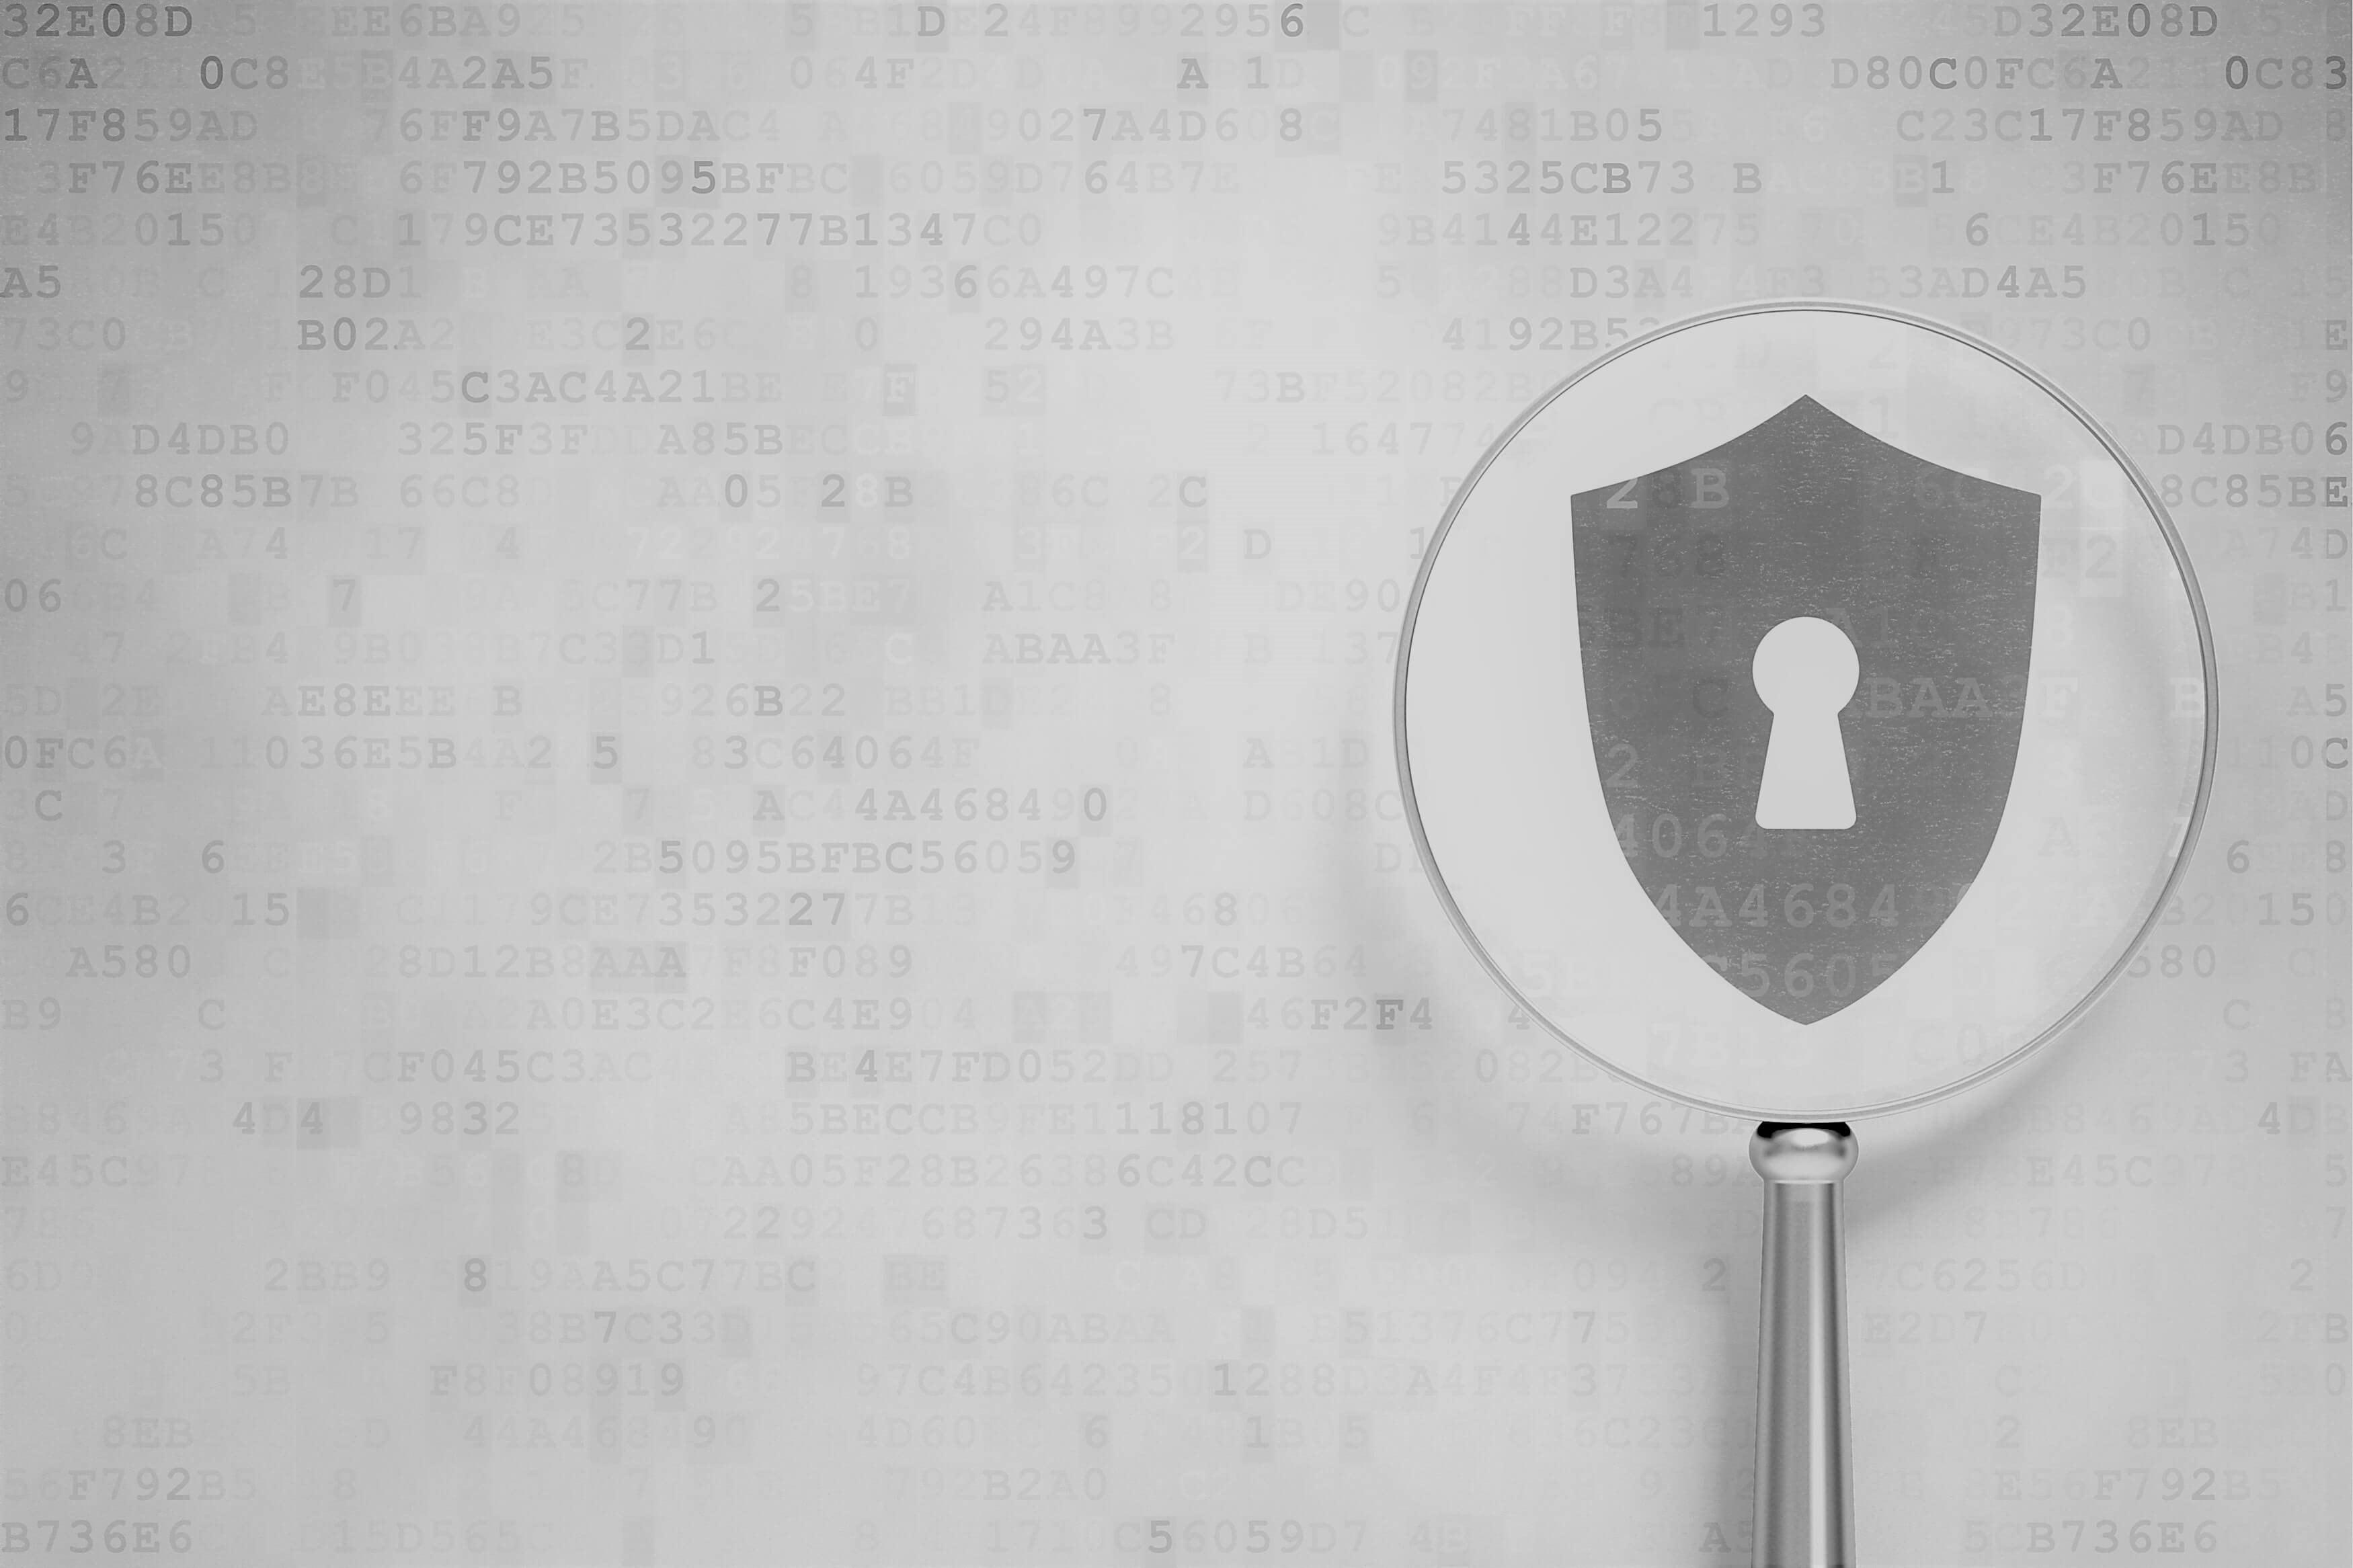 Will Recent Data Breaches Impact the 2018 Filing Season?